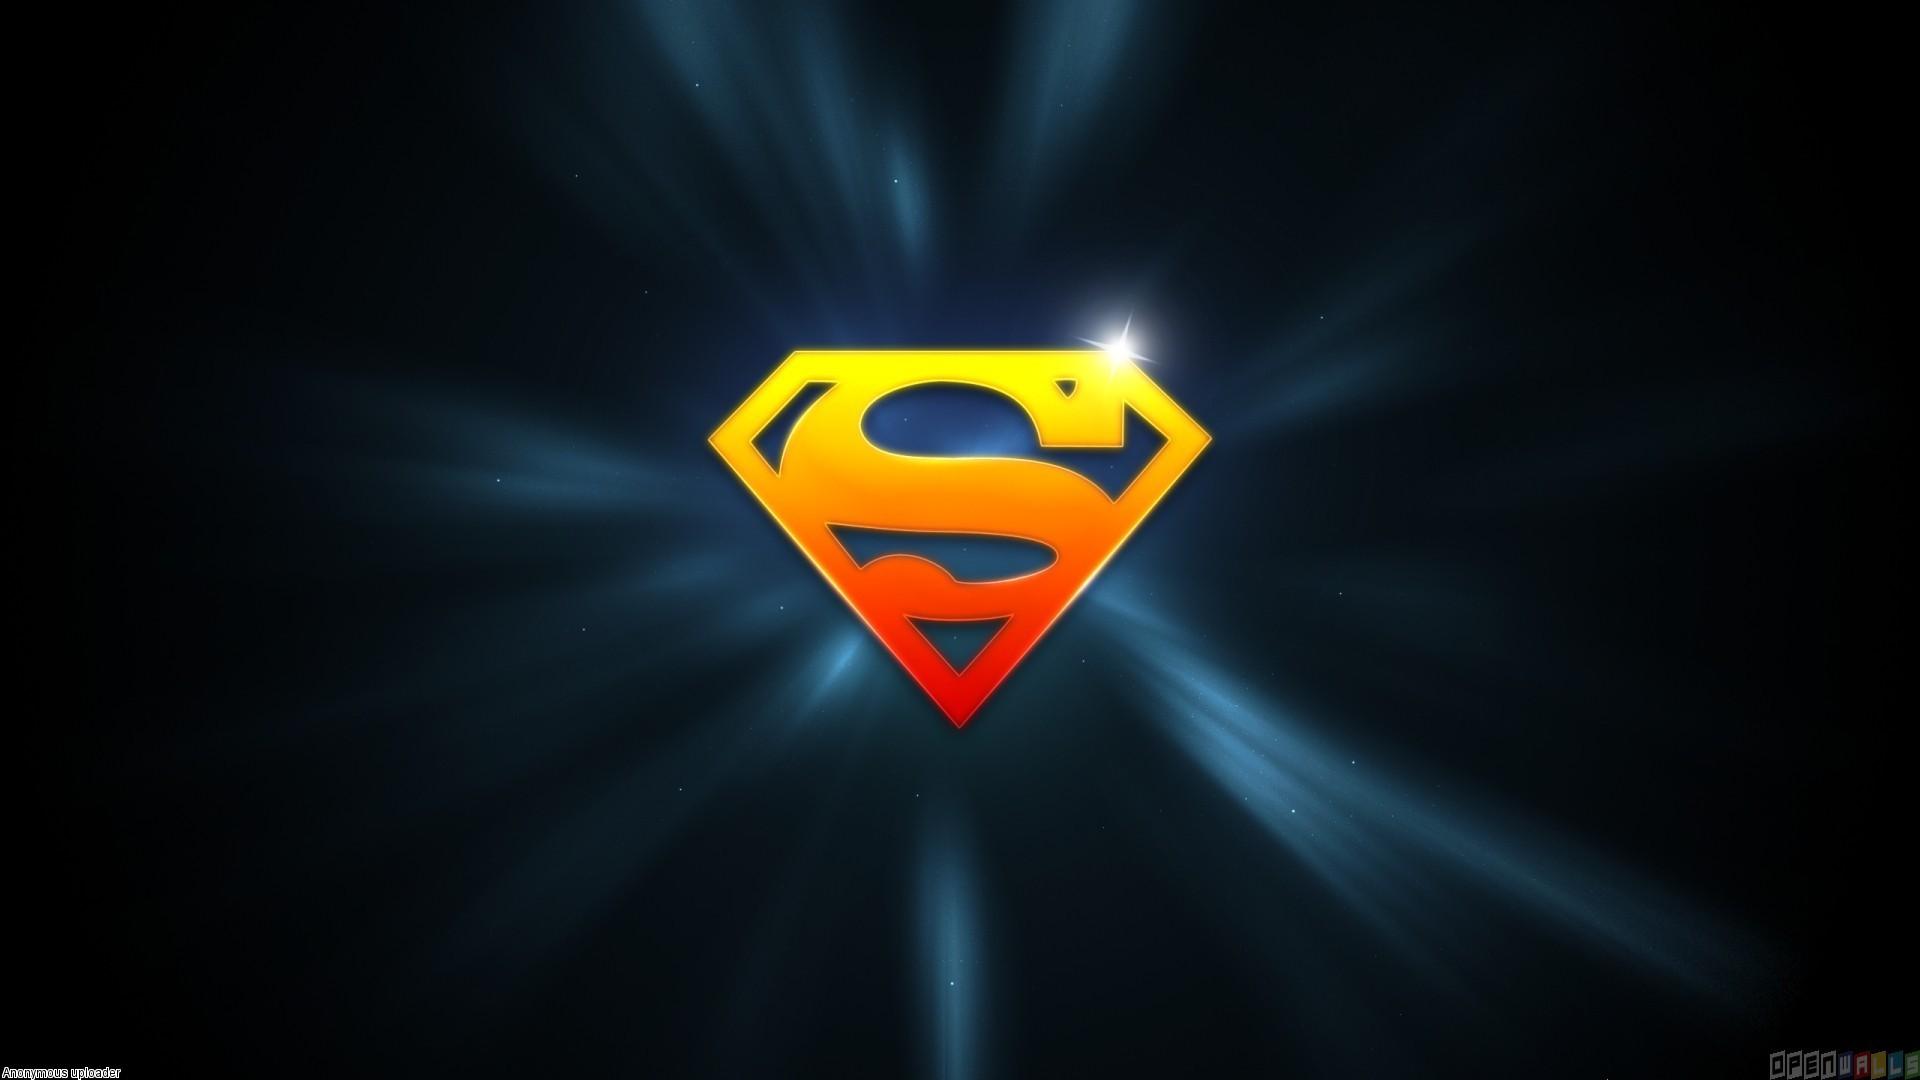 cool wallpaper hd superman logo wallpaper feedwallpaper feed